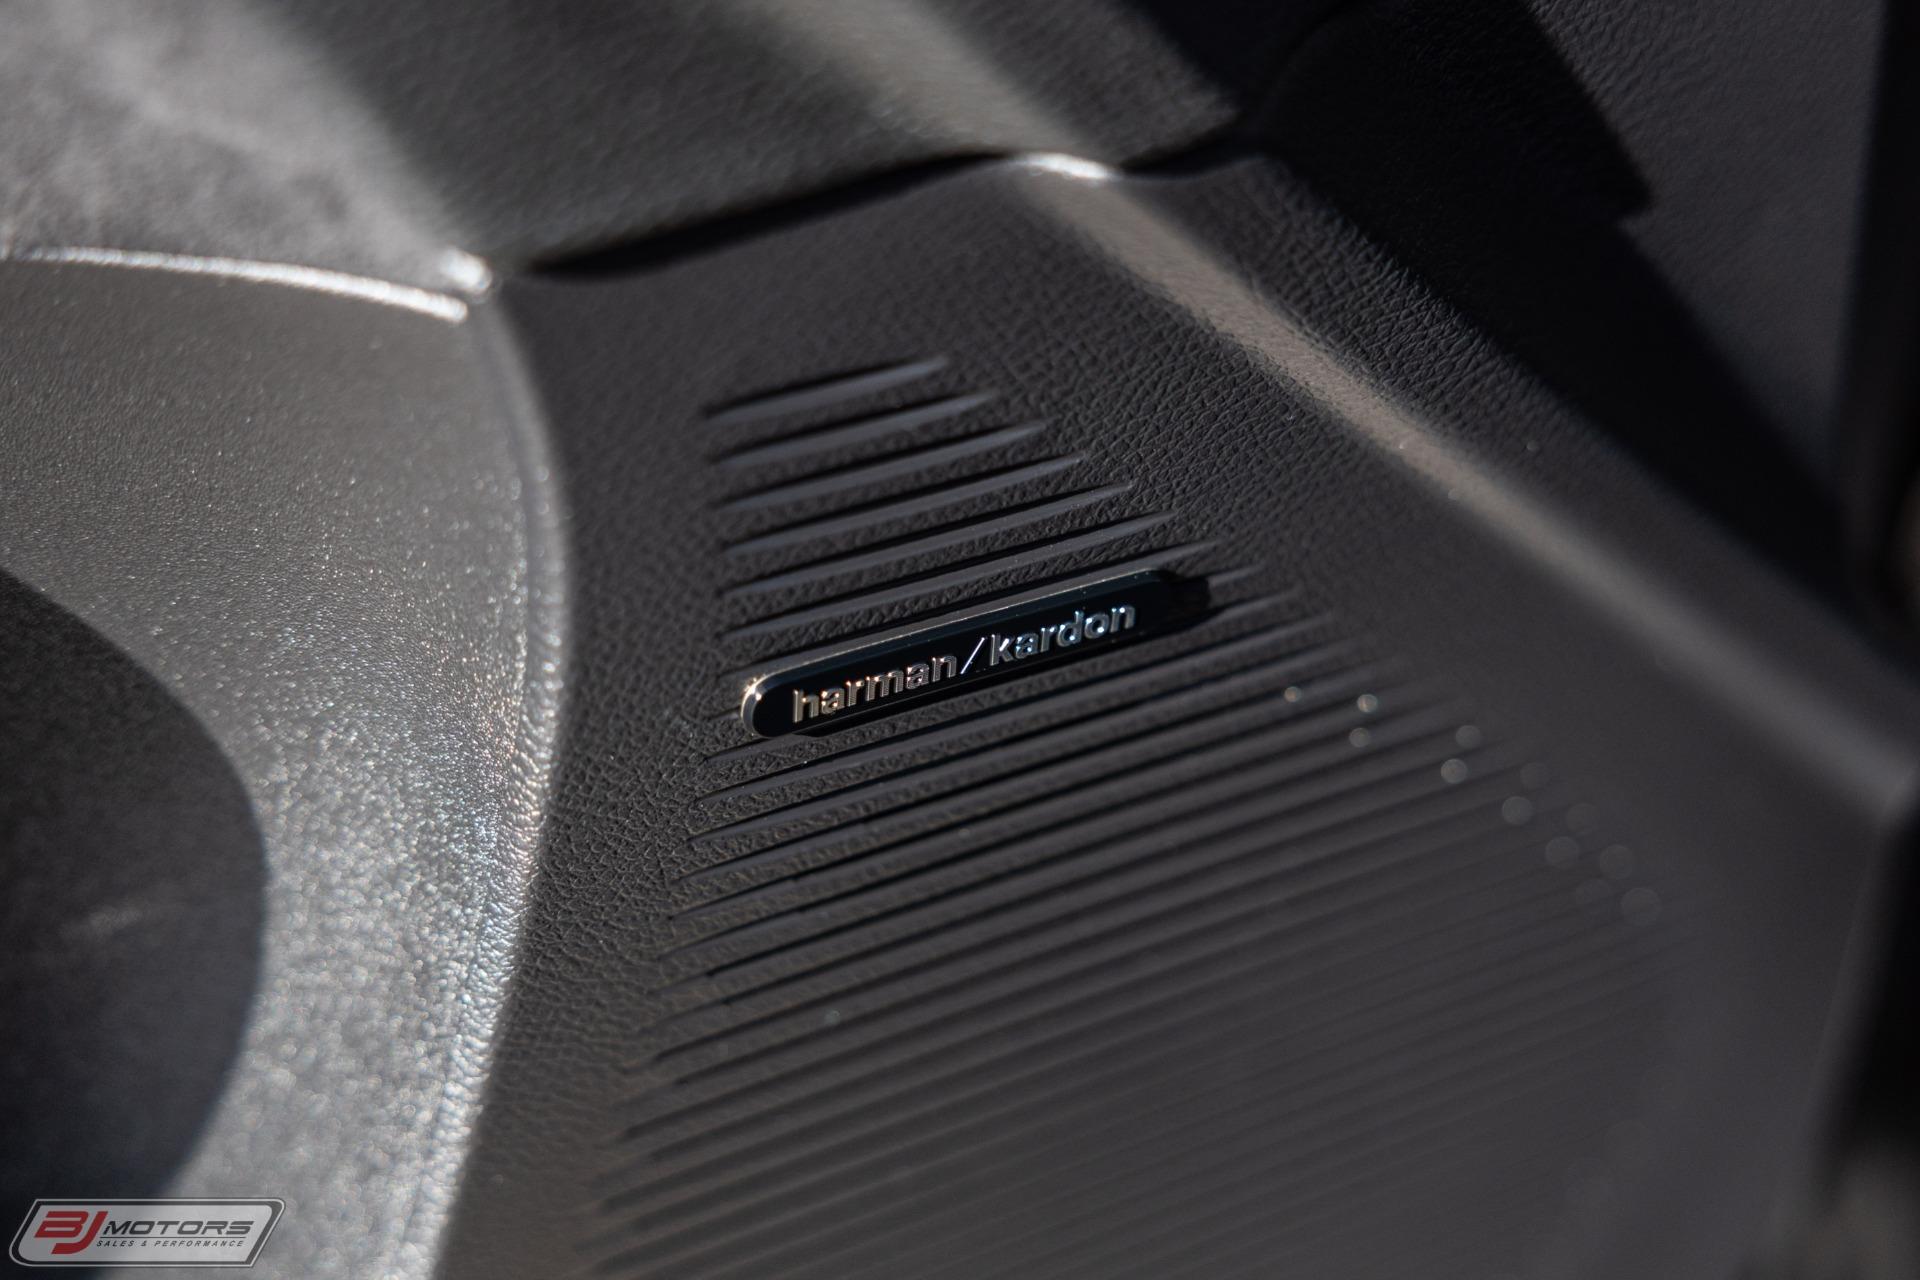 Used-2019-Dodge-Challenger-SRT-Hellcat-Redeye-Widebody